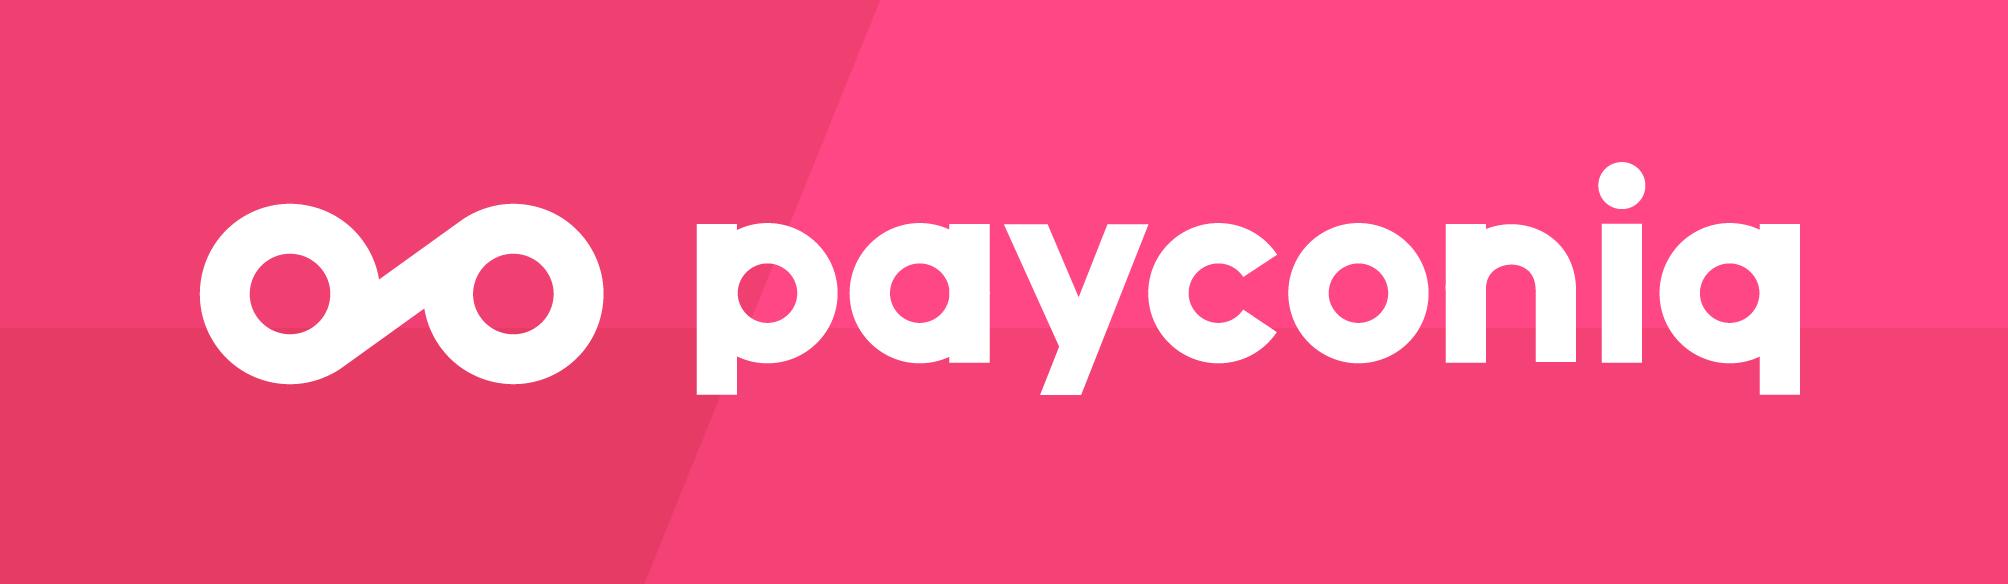 Payconiq_logo_terrasverwarmer.com